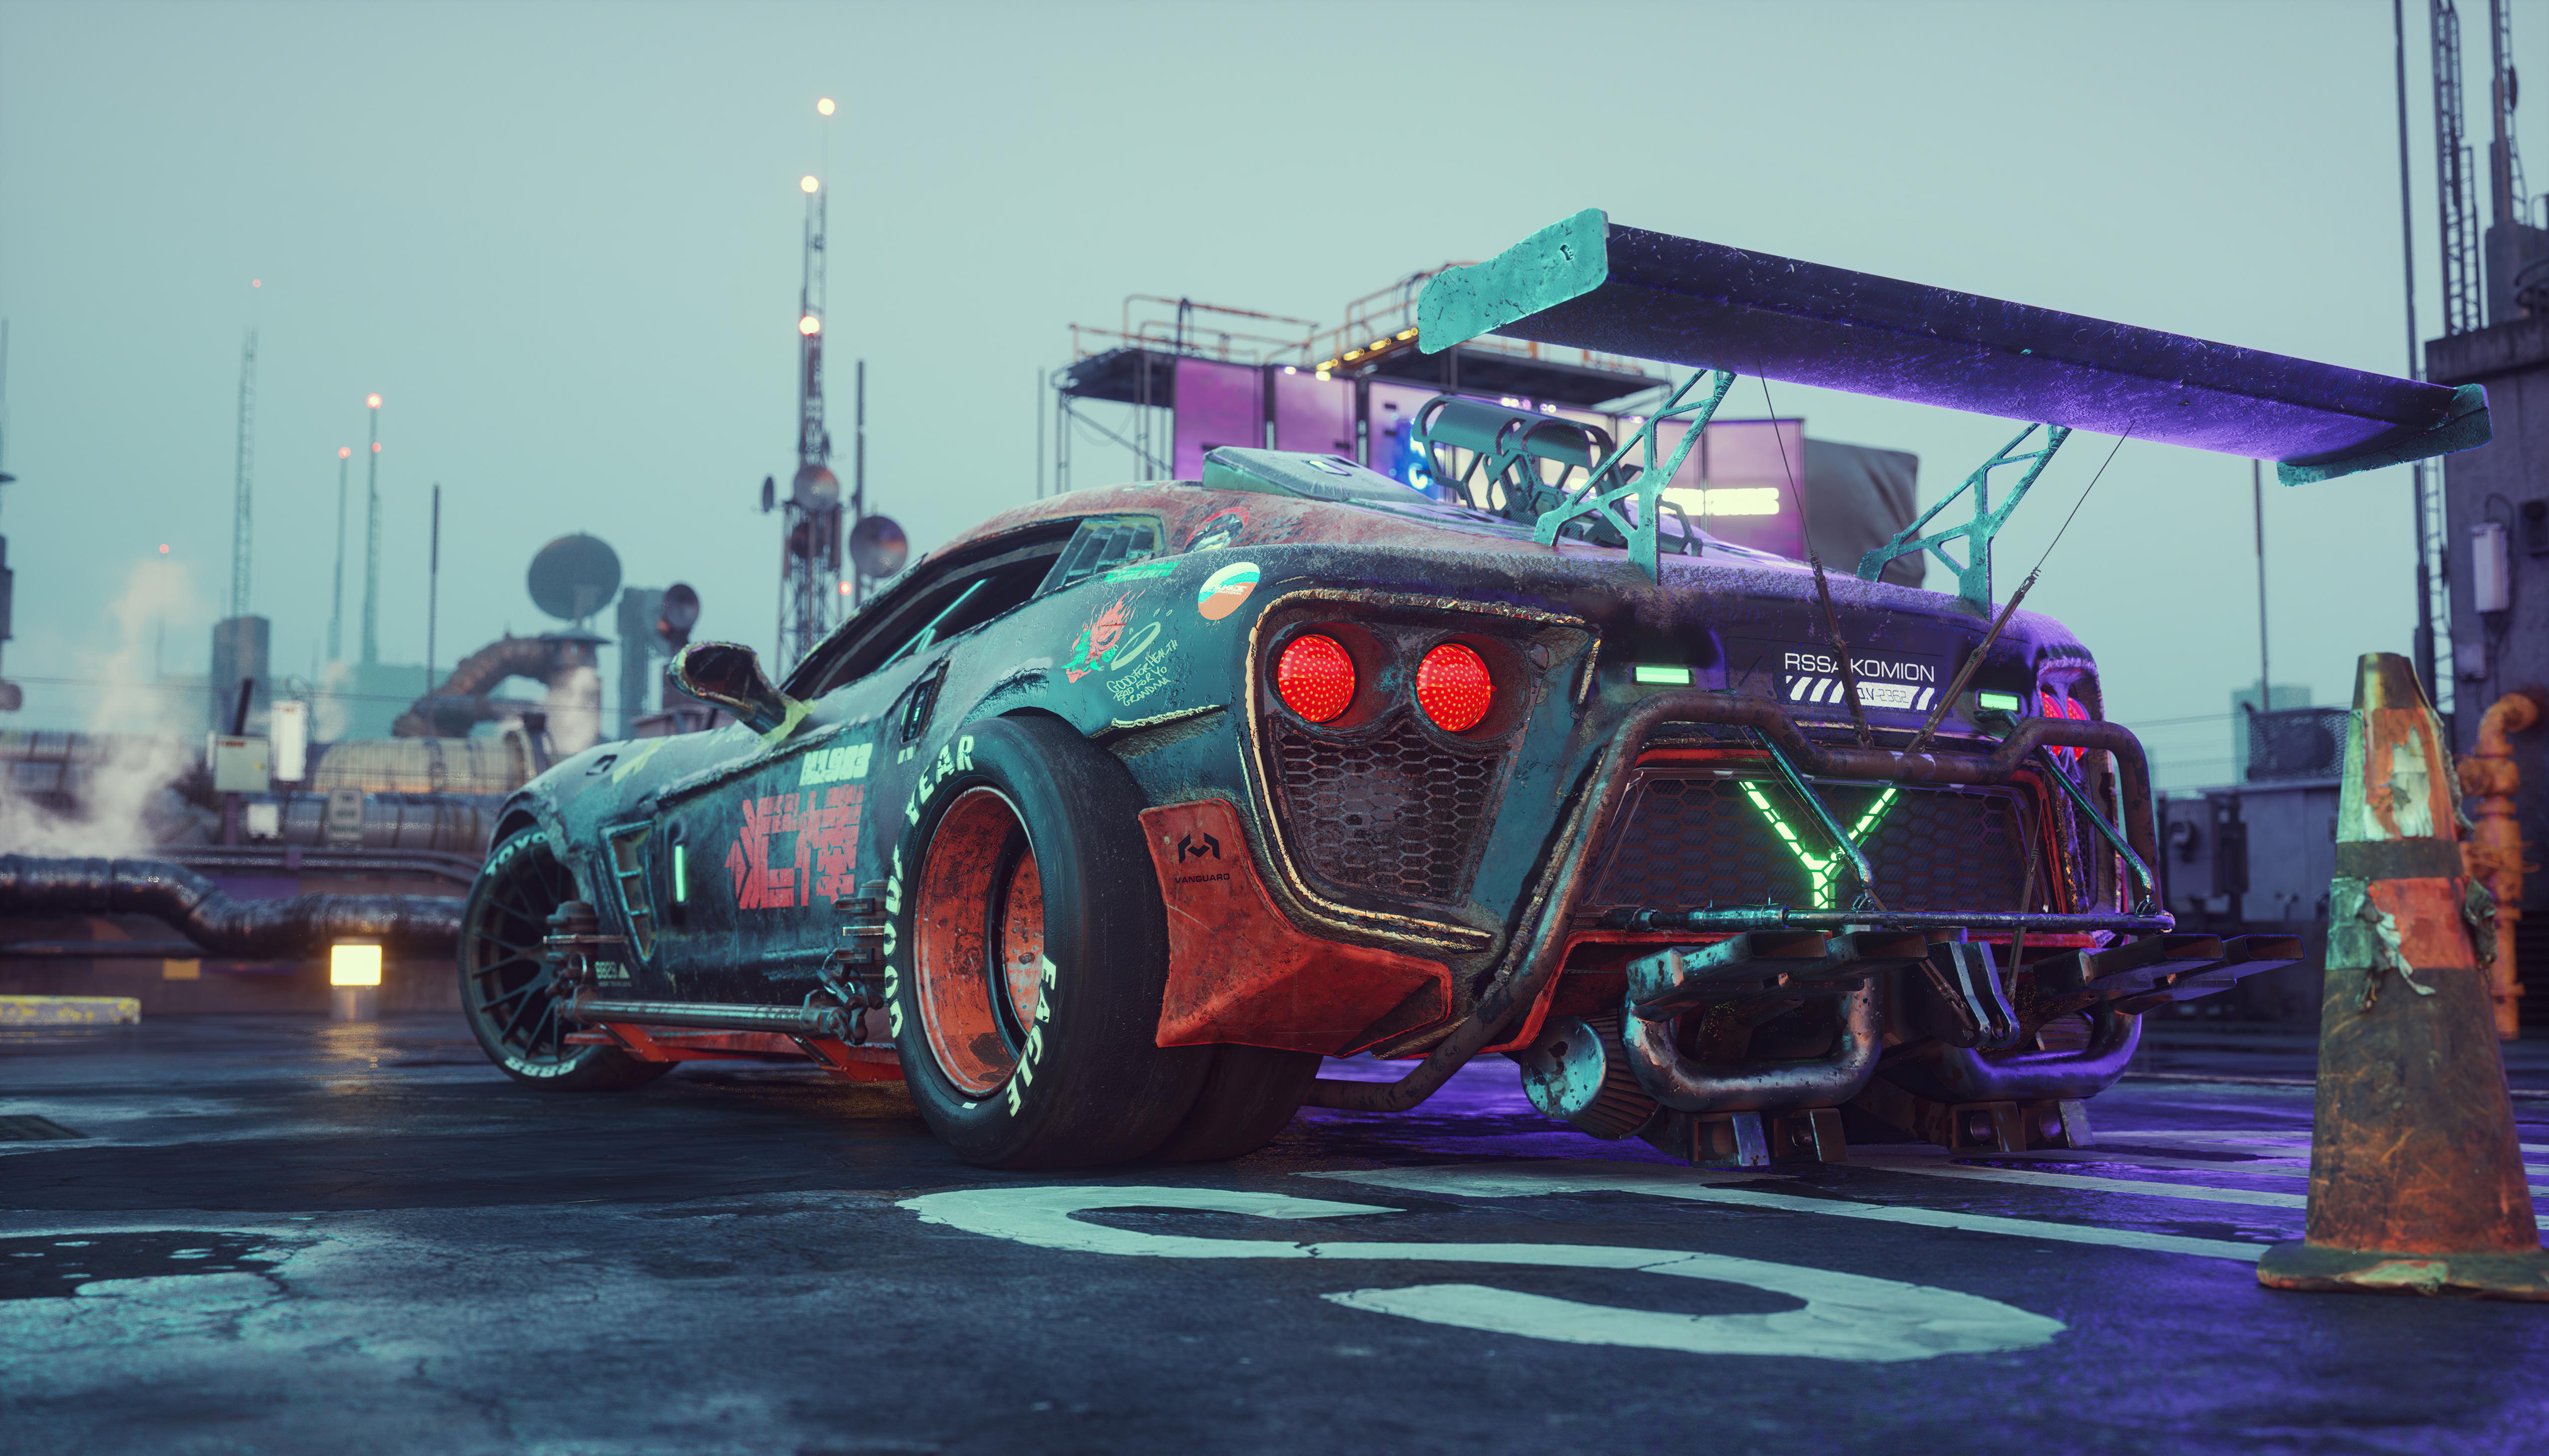 cyberpunkish flanker f concept car 4k 1620170556 1 - Cyberpunkish Flanker F Concept Car 4k - Cyberpunkish Flanker F Concept Car 4k wallpapers